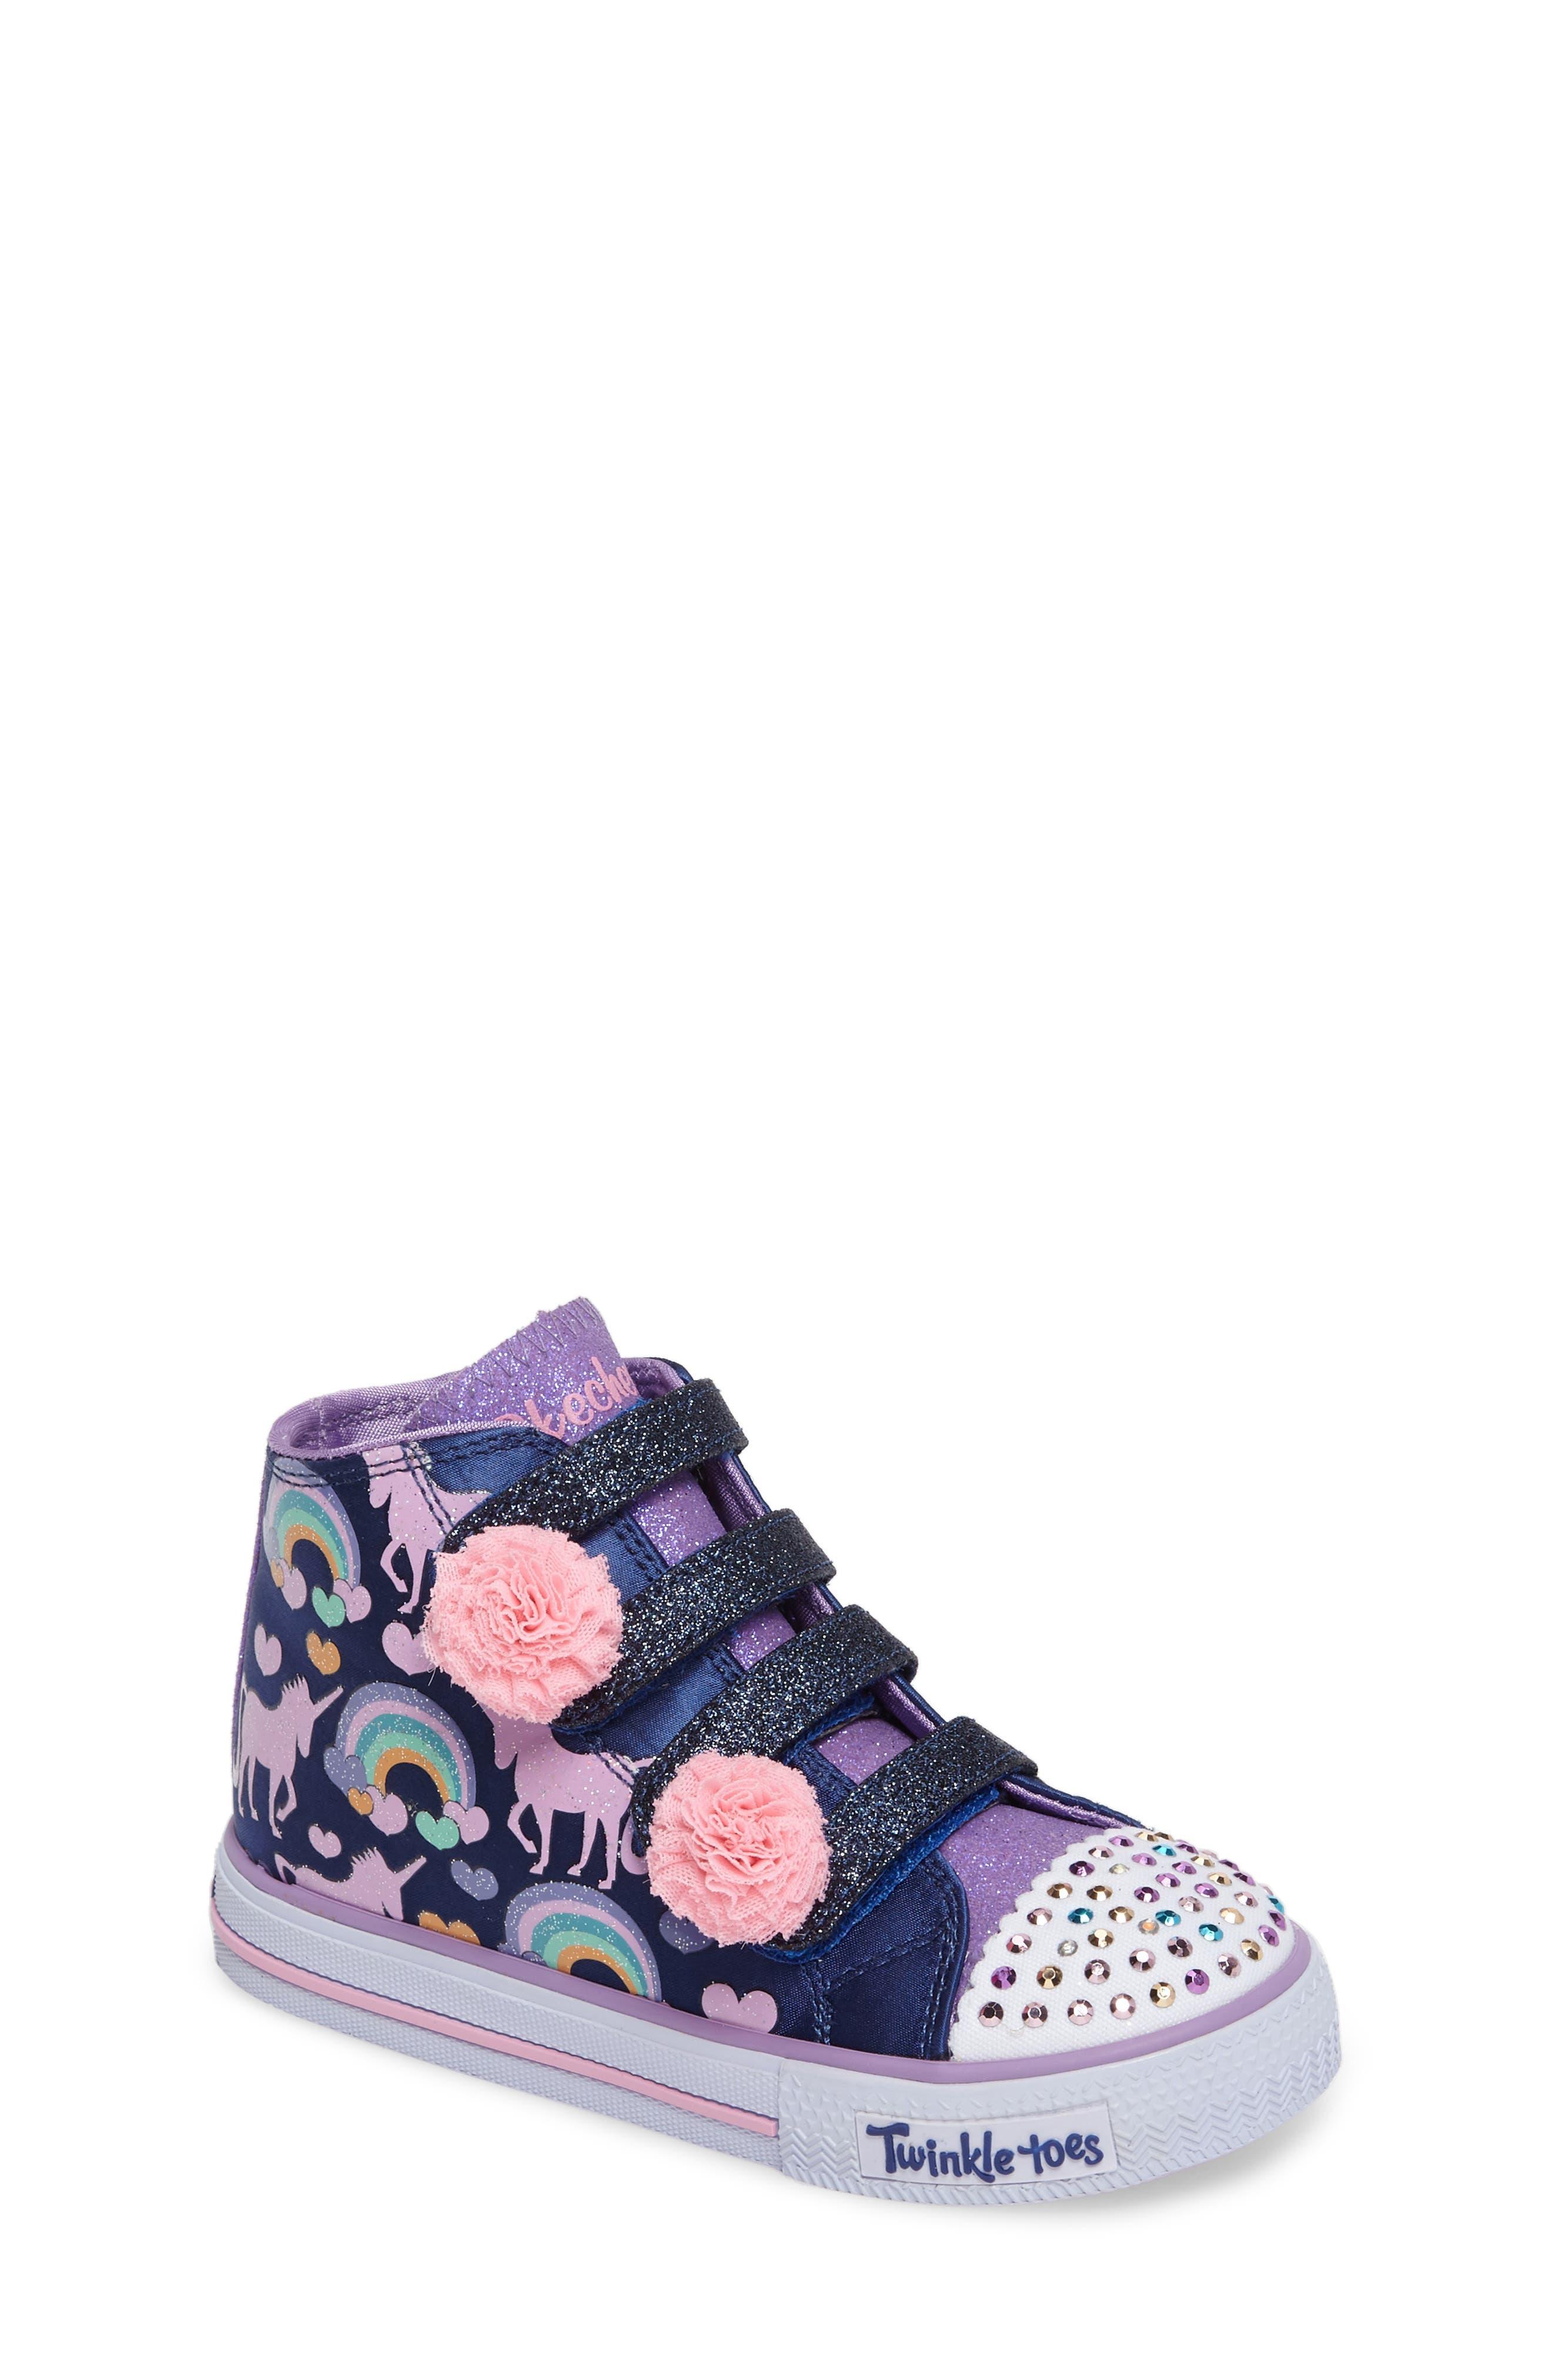 SKECHERS Twinkle Toes Shuffles High Top Sneaker